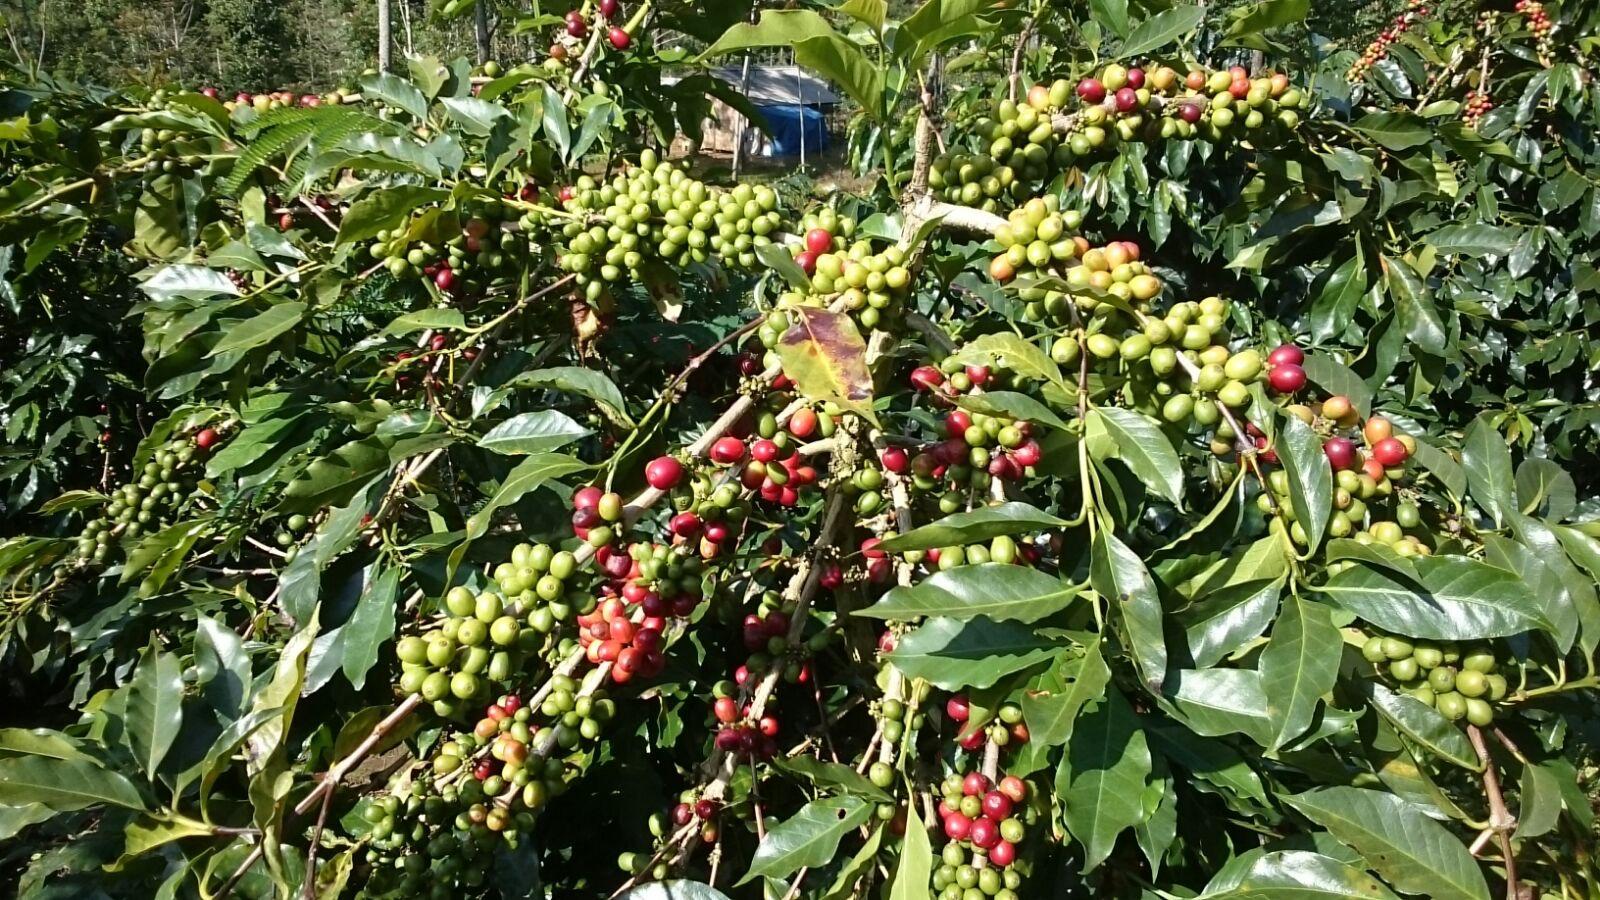 Sigararutang coffee tree from Weninggalih plantation